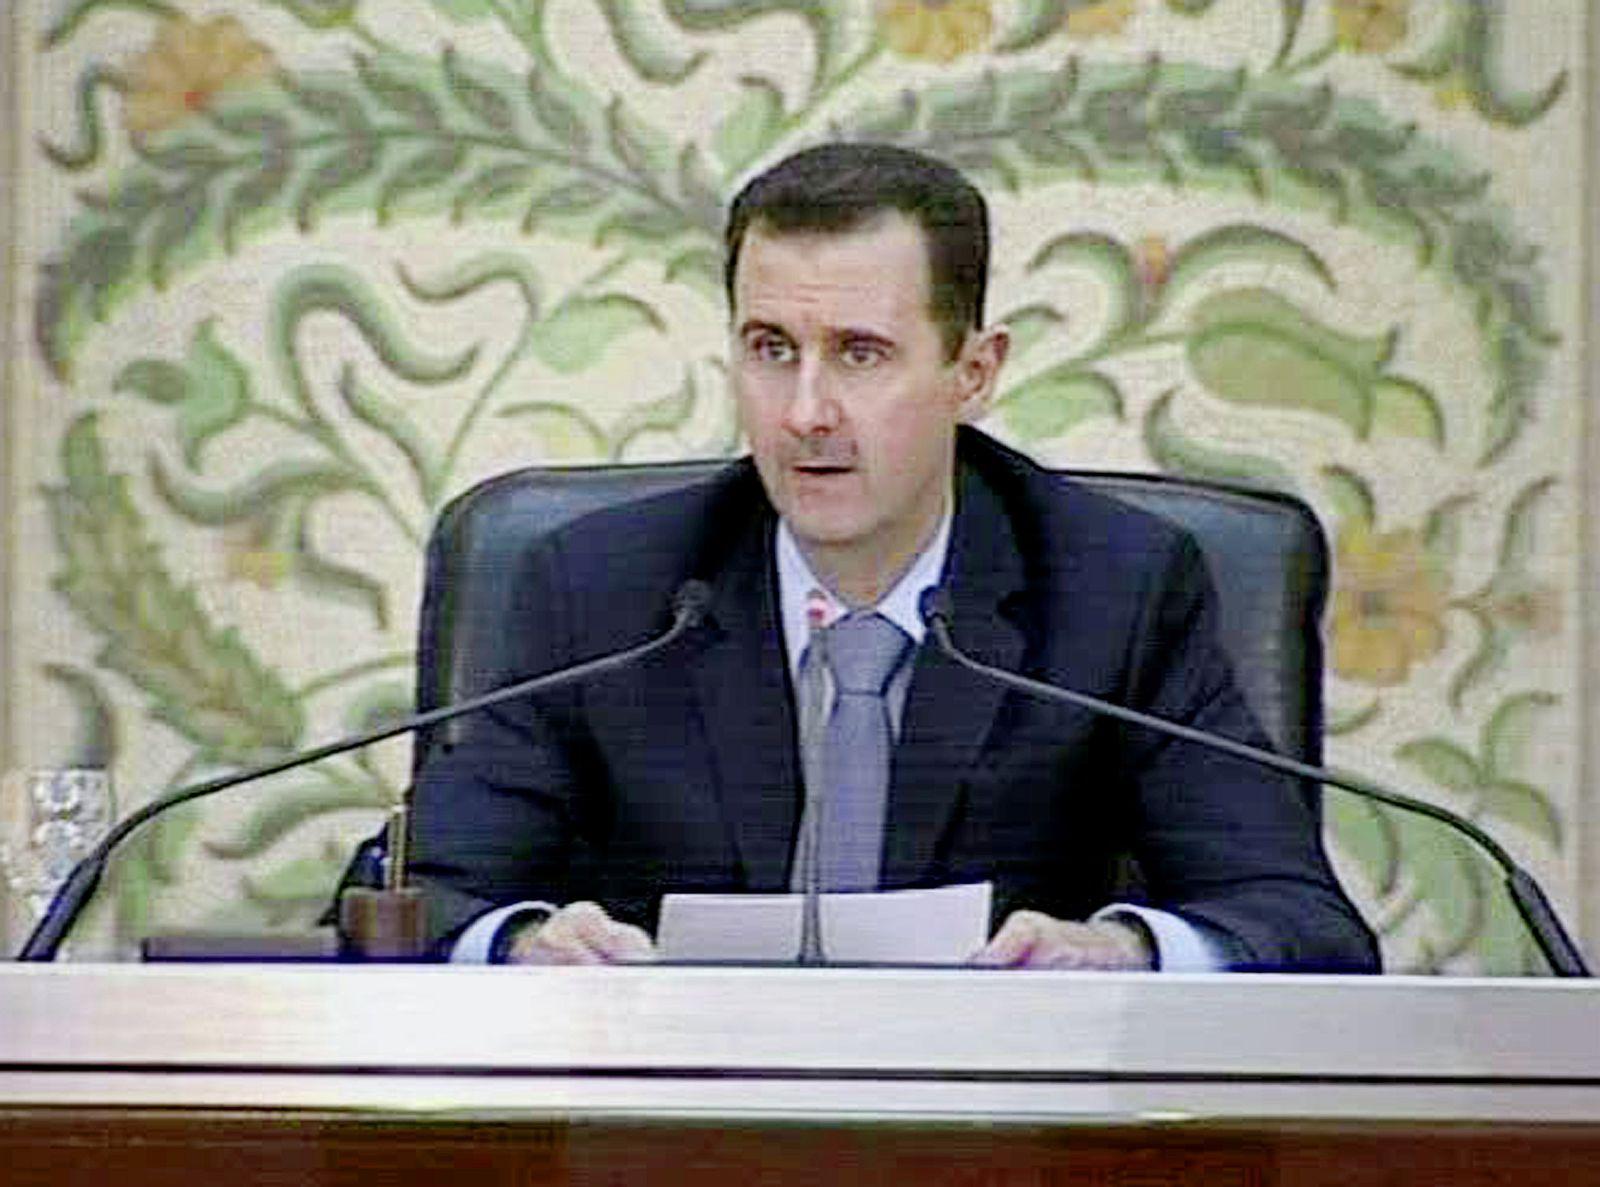 Syrien Proteste / Assad